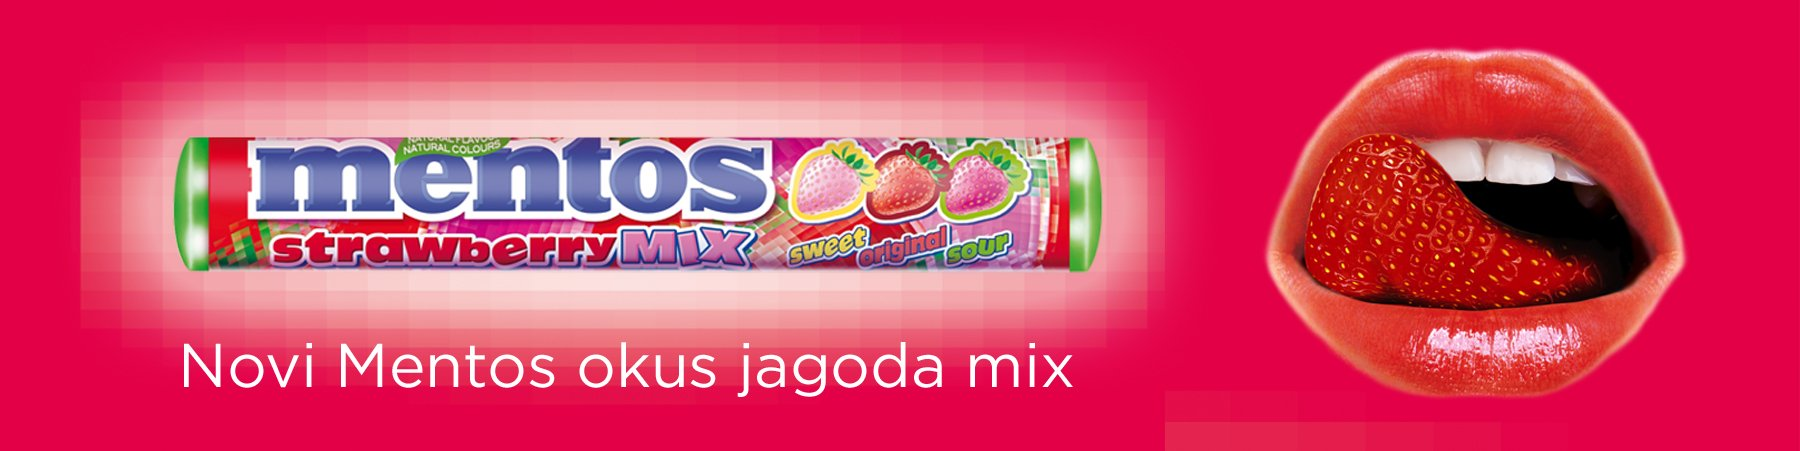 Mentos_jagoda-mix